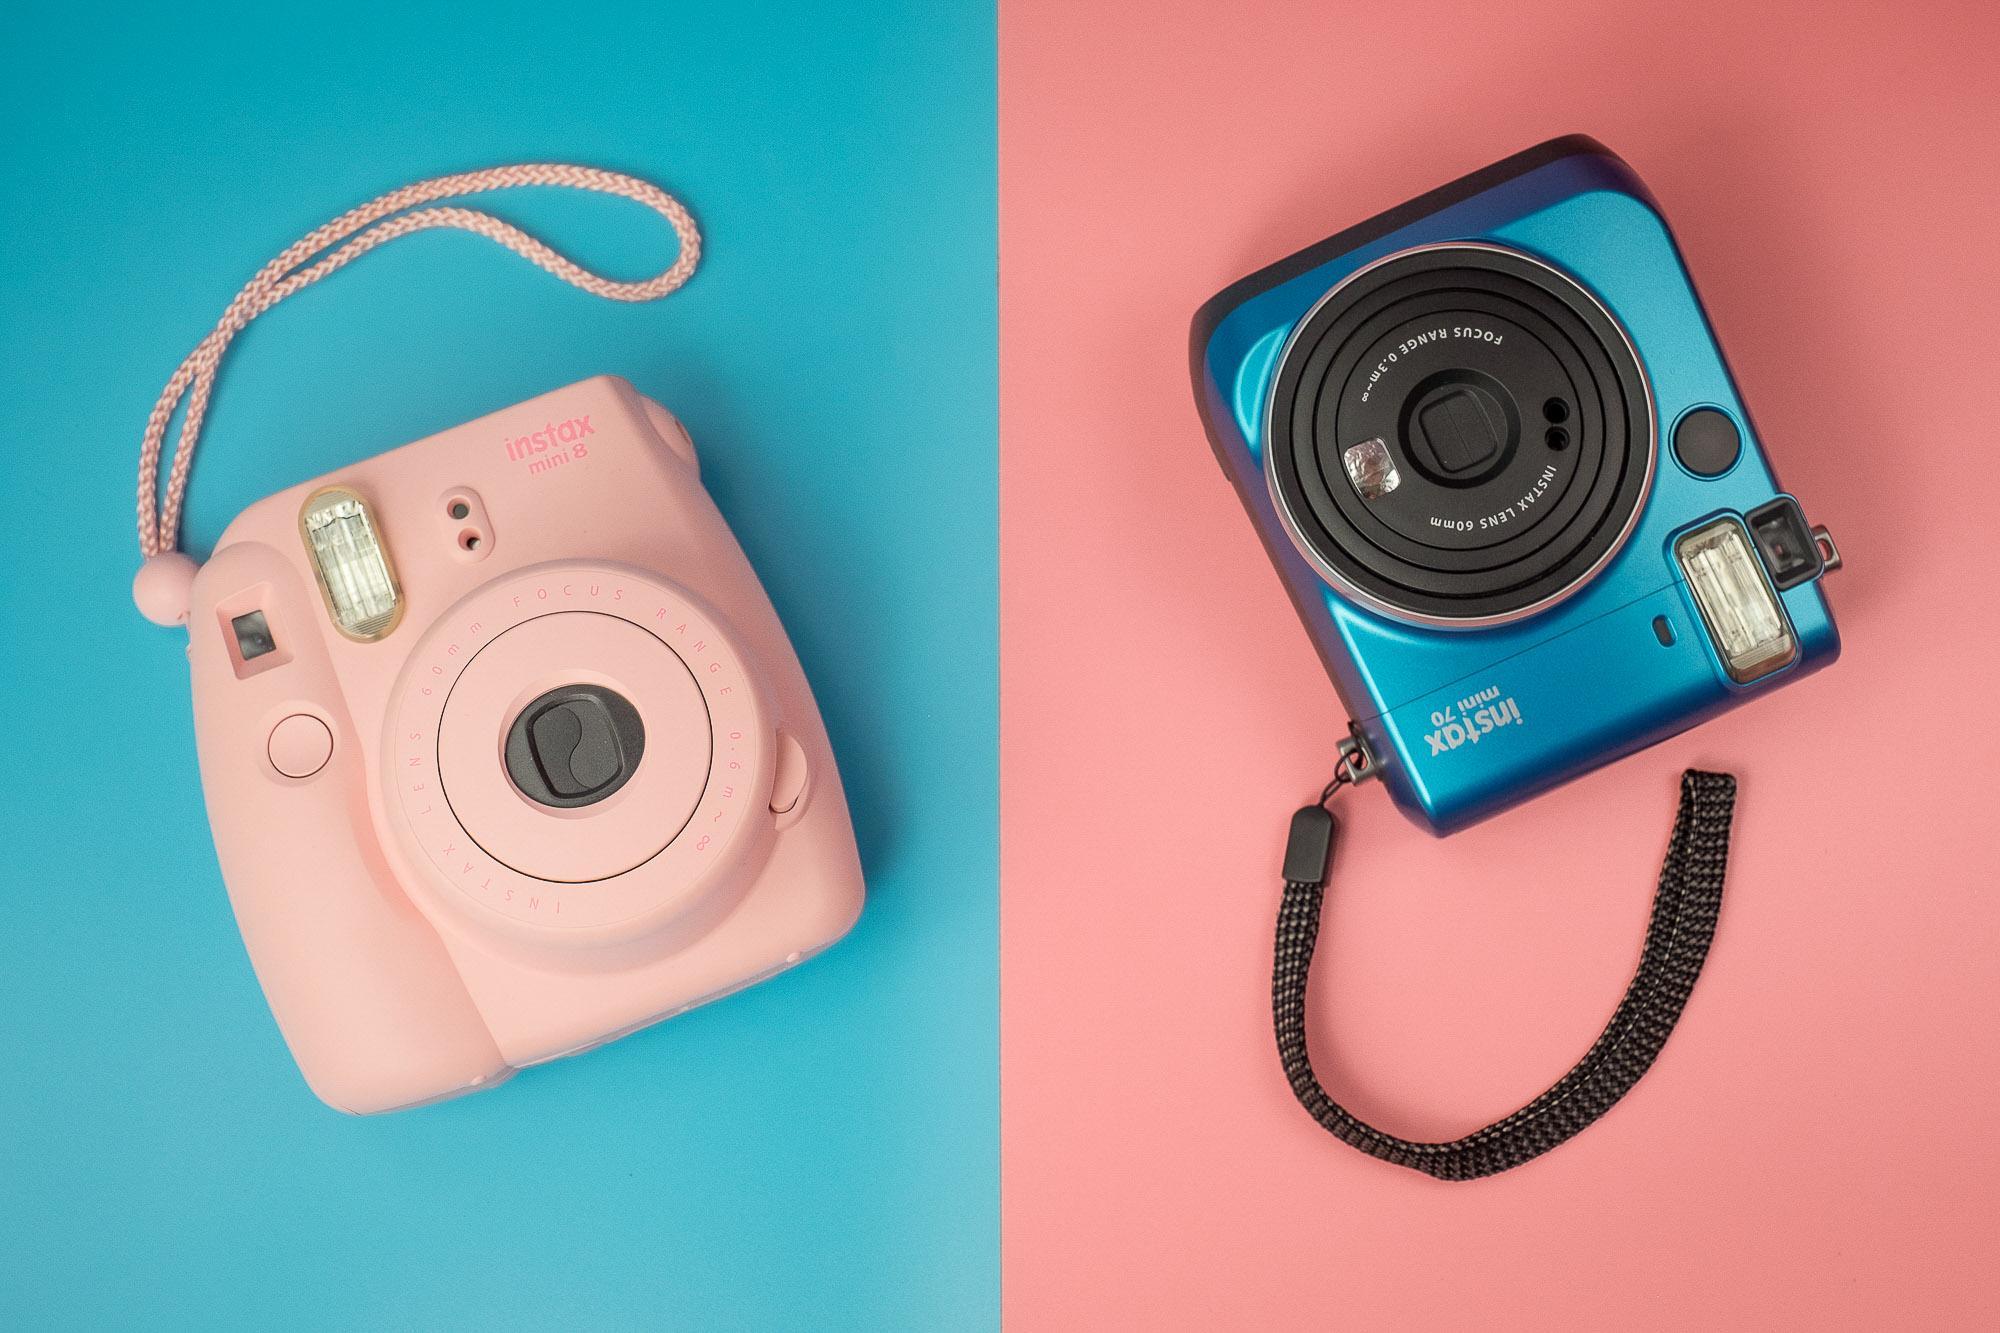 Intax mini 8 70 pink bleu singapore fujifilm product photography commercial photographer sg photoshoot